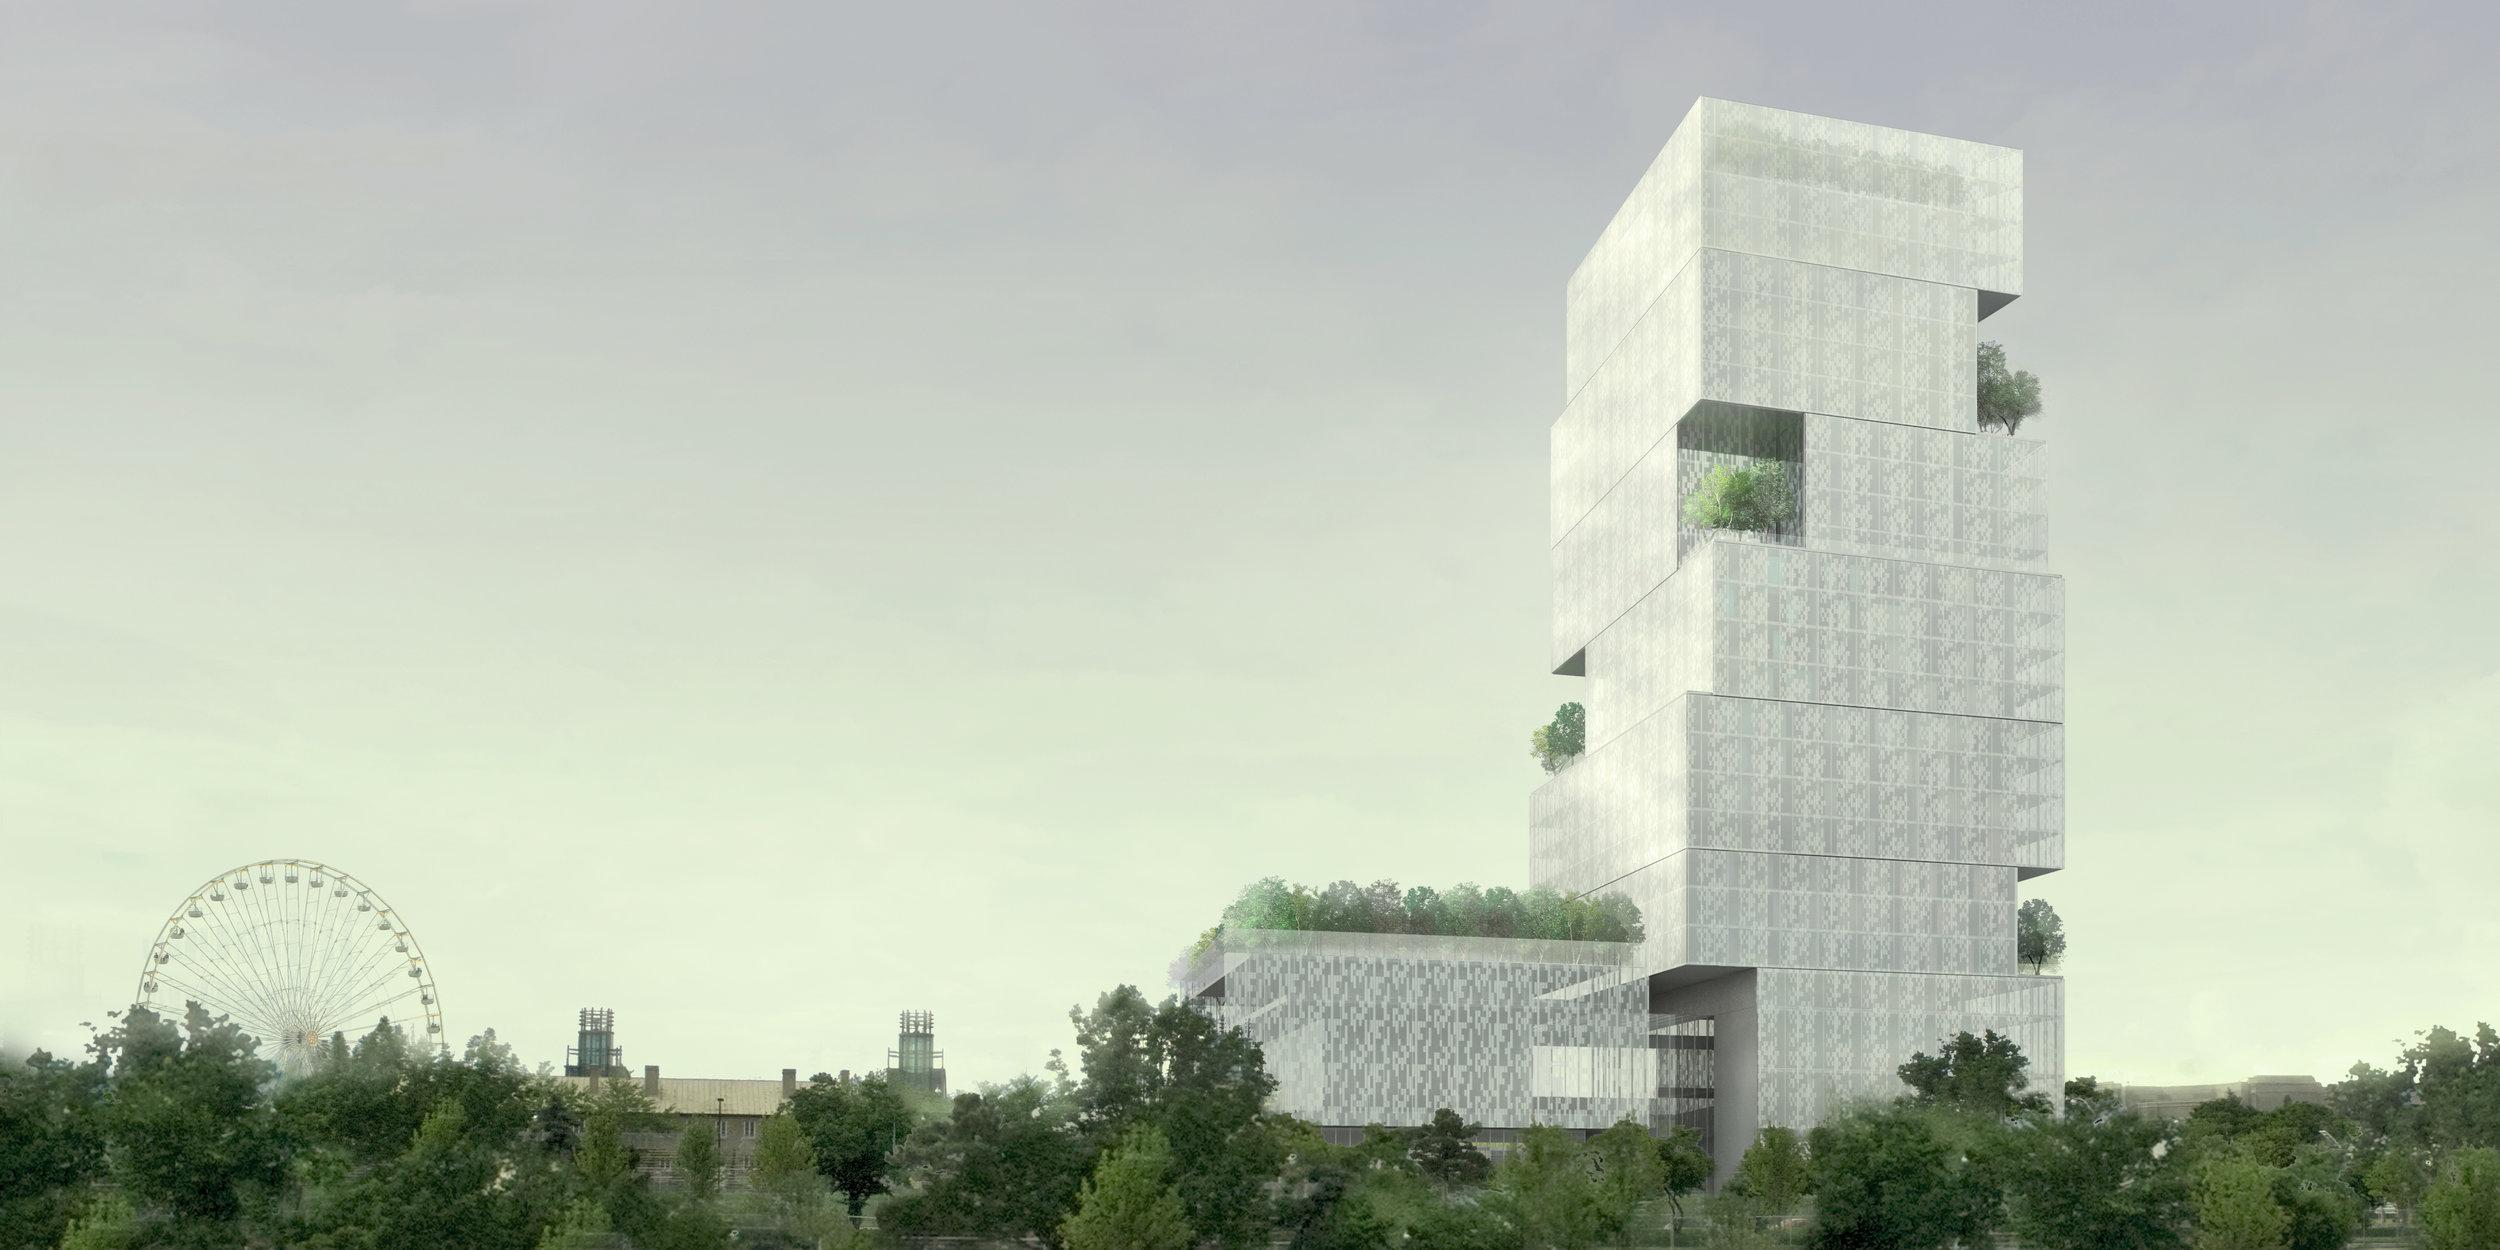 CNE Hotel - trees ferris wheel tower